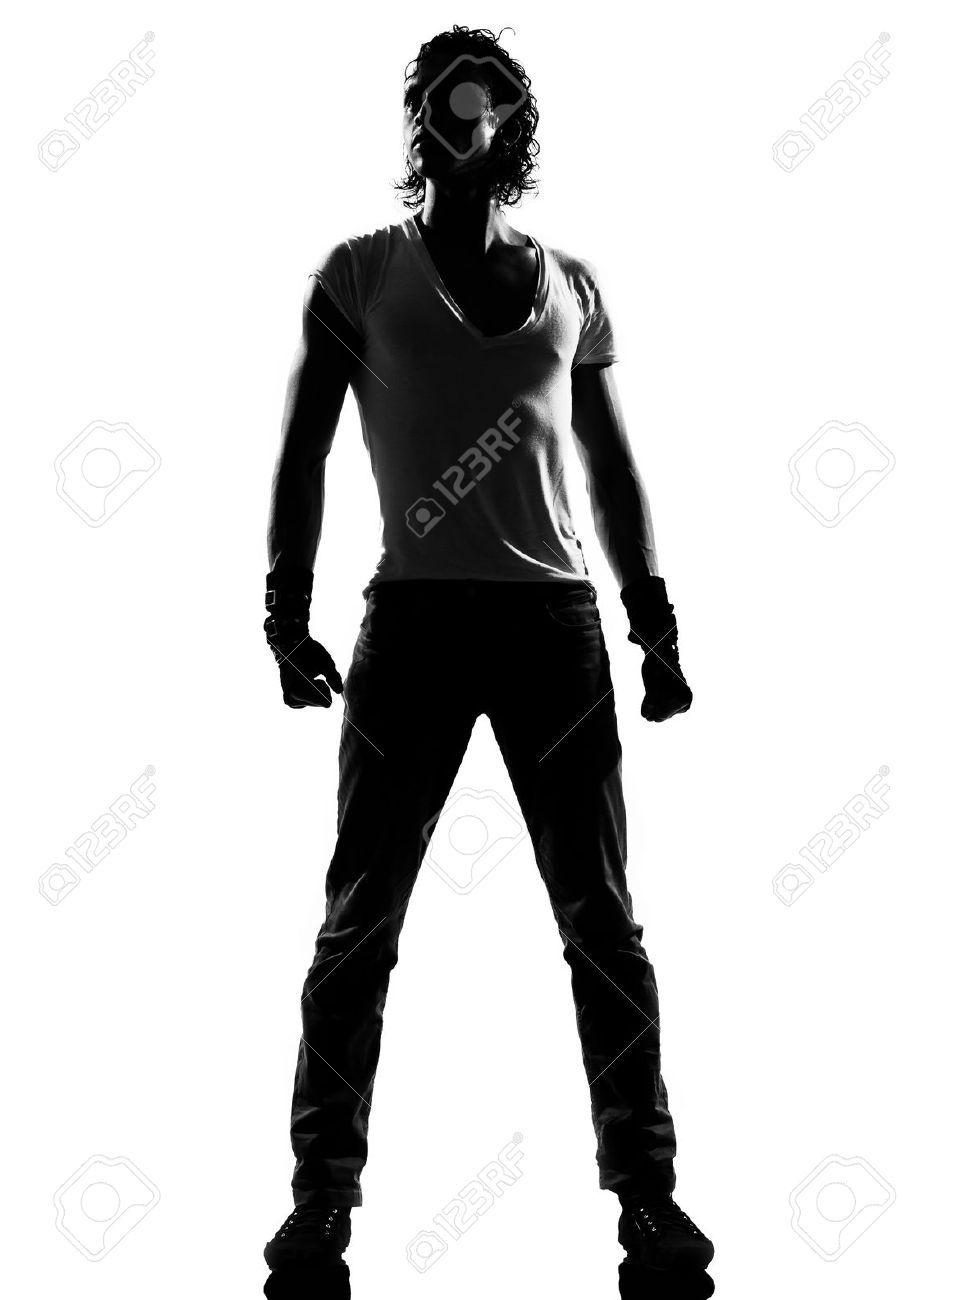 971x1300 Man Dancing Silhouette